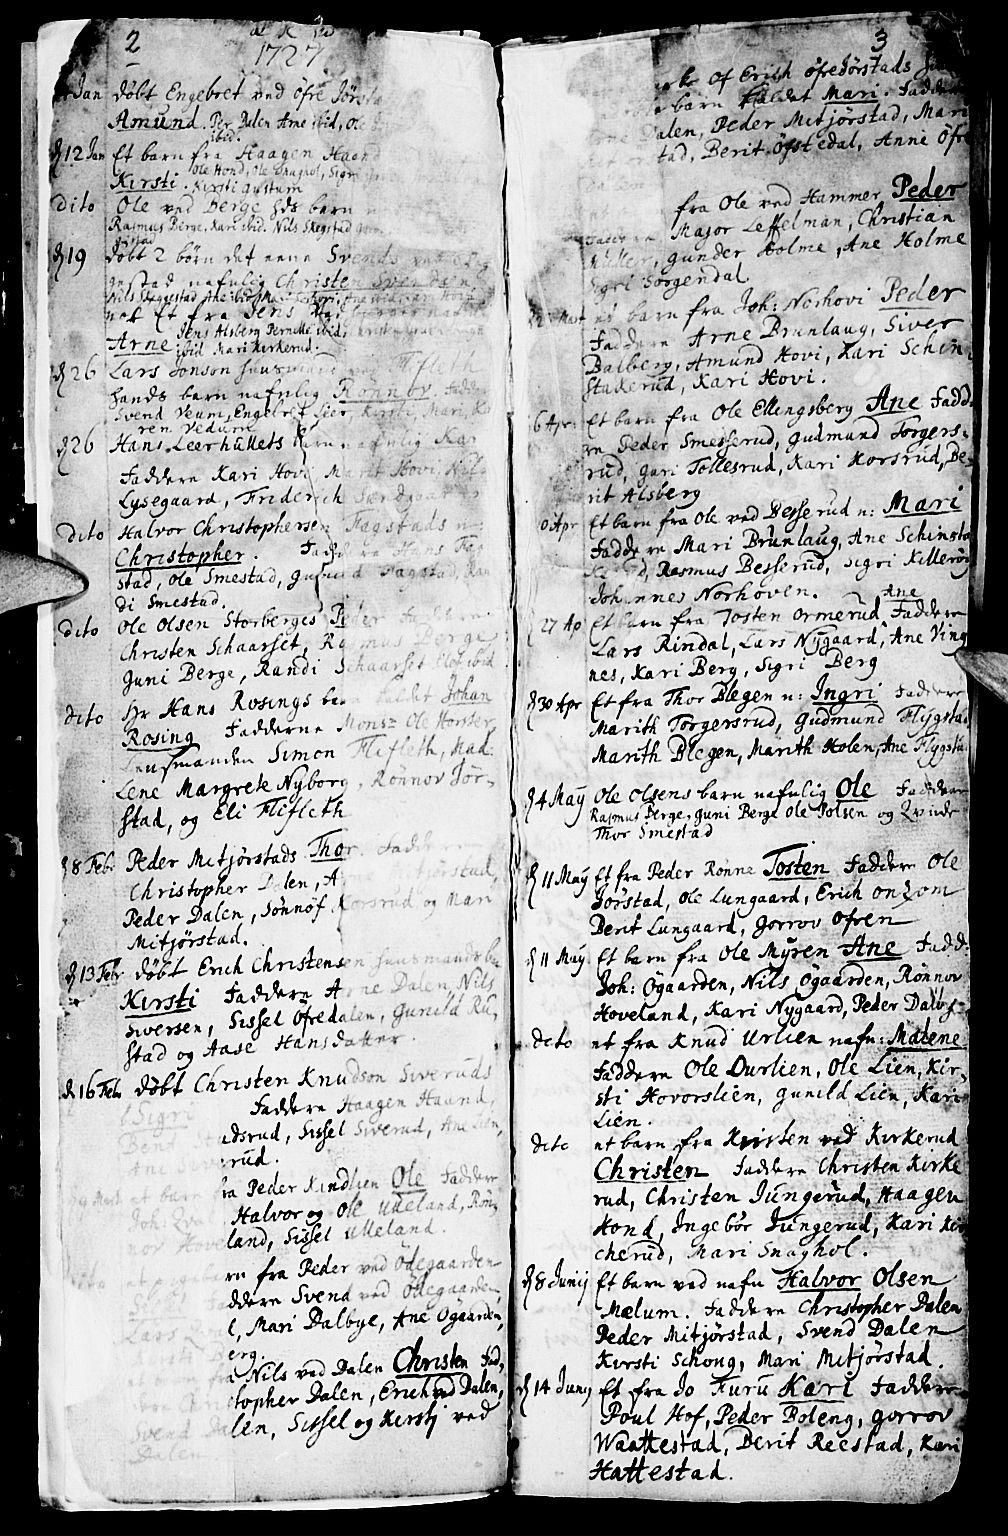 SAH, Fåberg prestekontor, Ministerialbok nr. 1, 1727-1775, s. 2-3